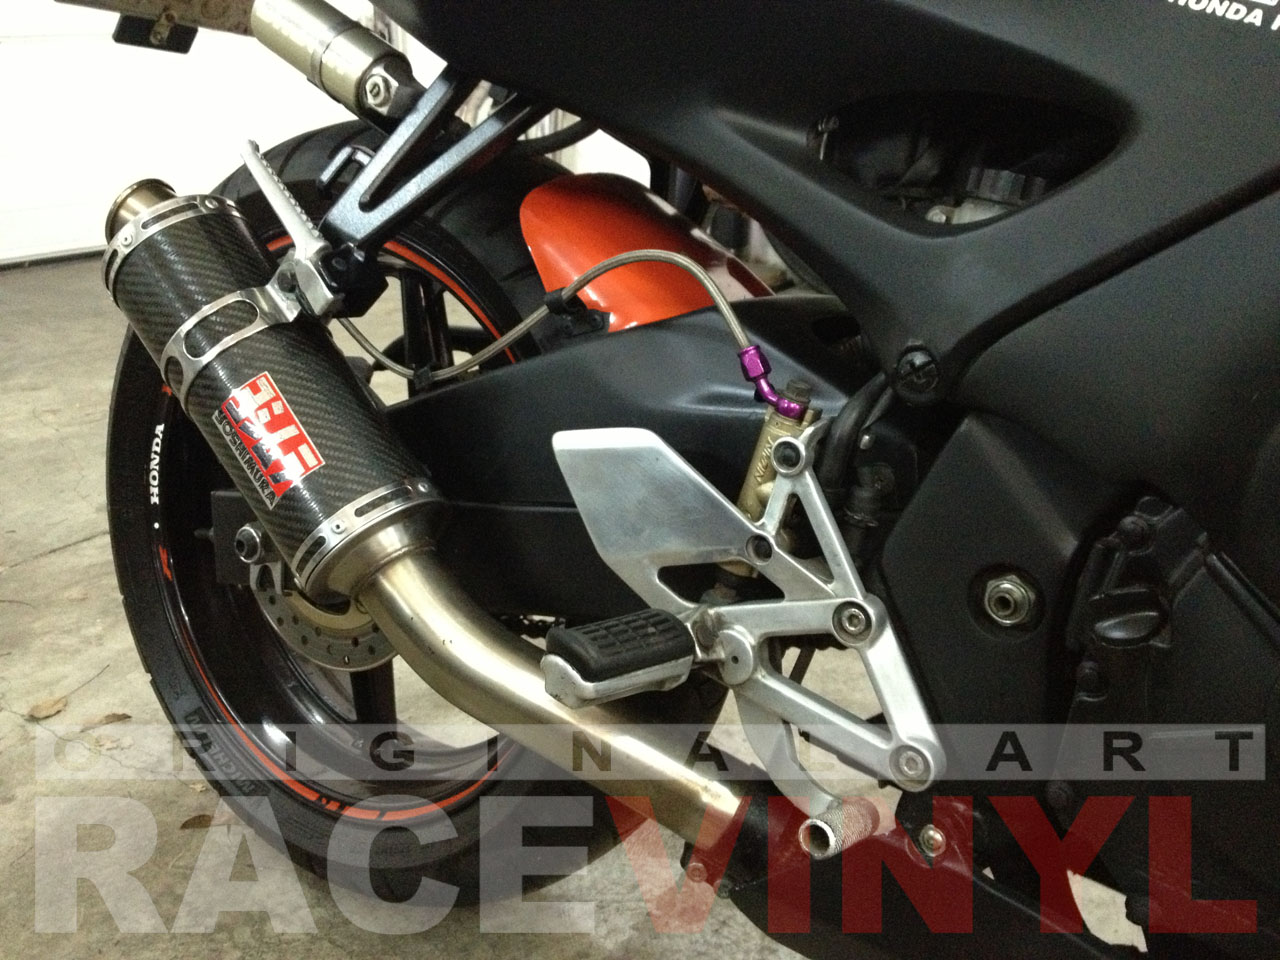 Honda Cbr 600 F3 Pc31 Honda Race Aitor Jimenez Racevinyl Europe